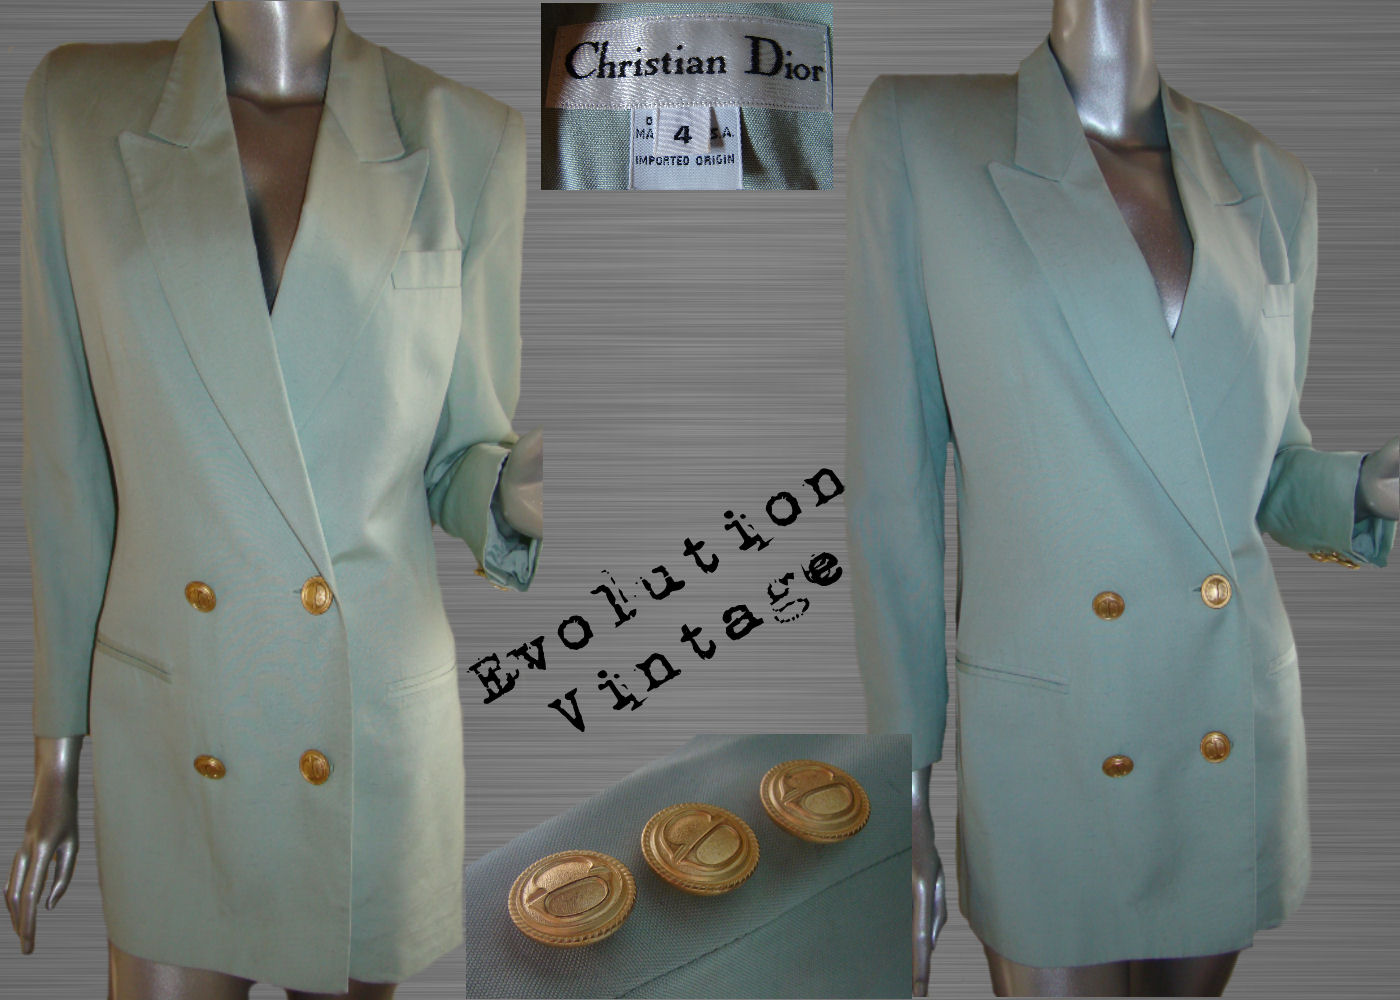 http://4.bp.blogspot.com/-2W-2RhDdERs/T5MNPC_7GKI/AAAAAAAAD90/MS_kt78E92A/s1600/Mint+Dior+Jacket.jpg